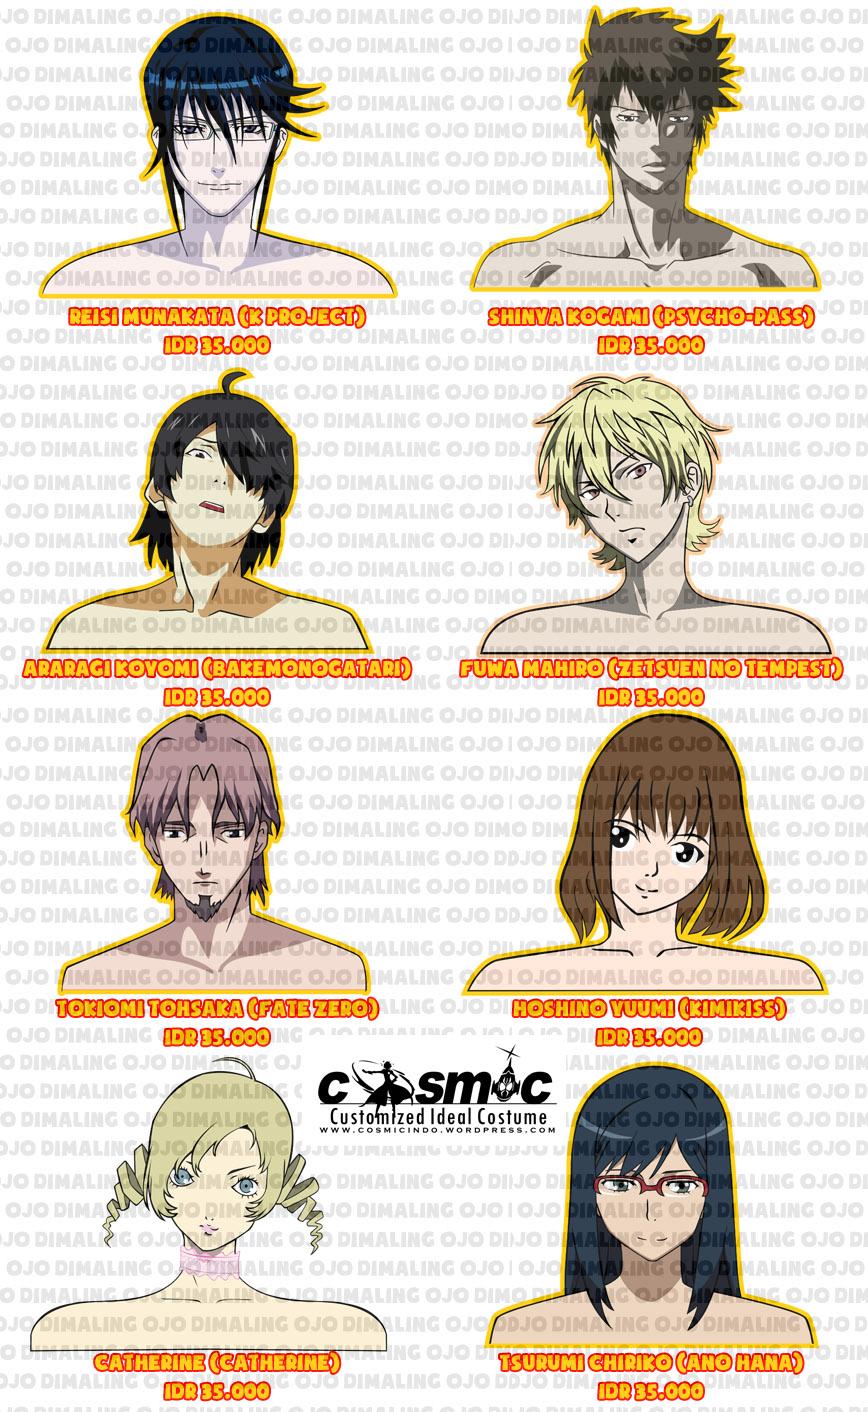 jual-kostum-cosplay---088806003287---katalog--hanger-anime-keren